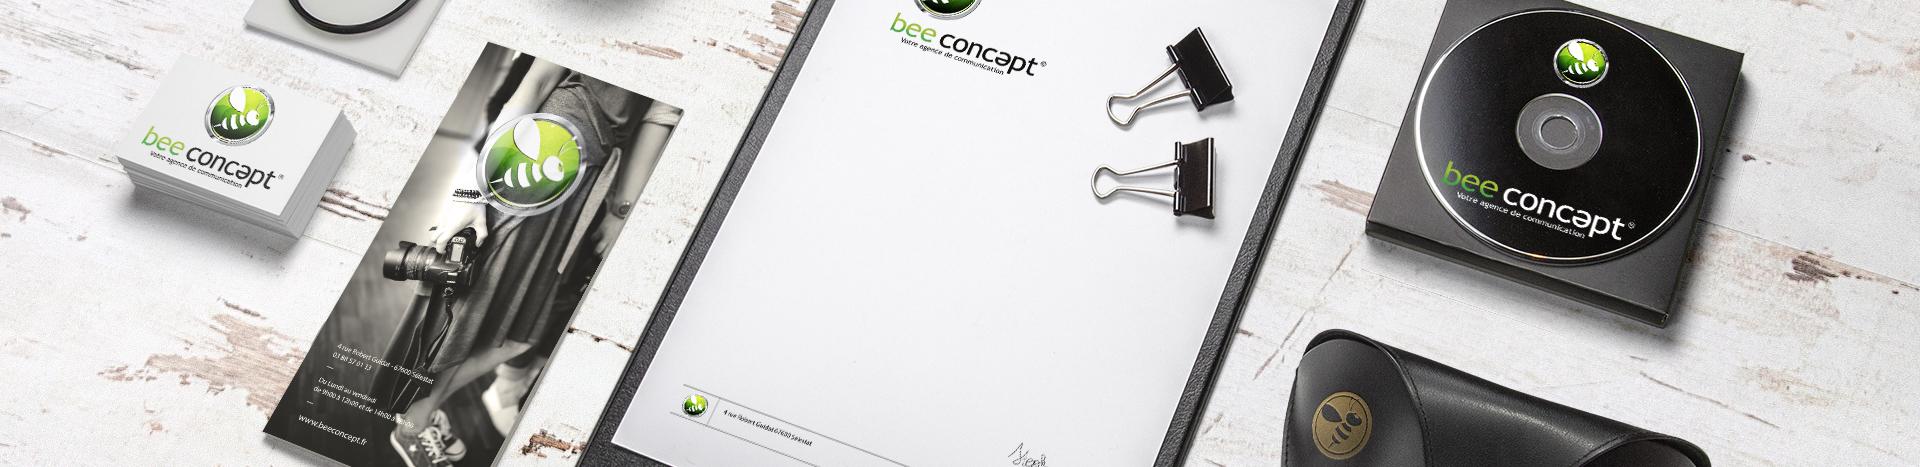 beeconcept-slide1-ar-plan